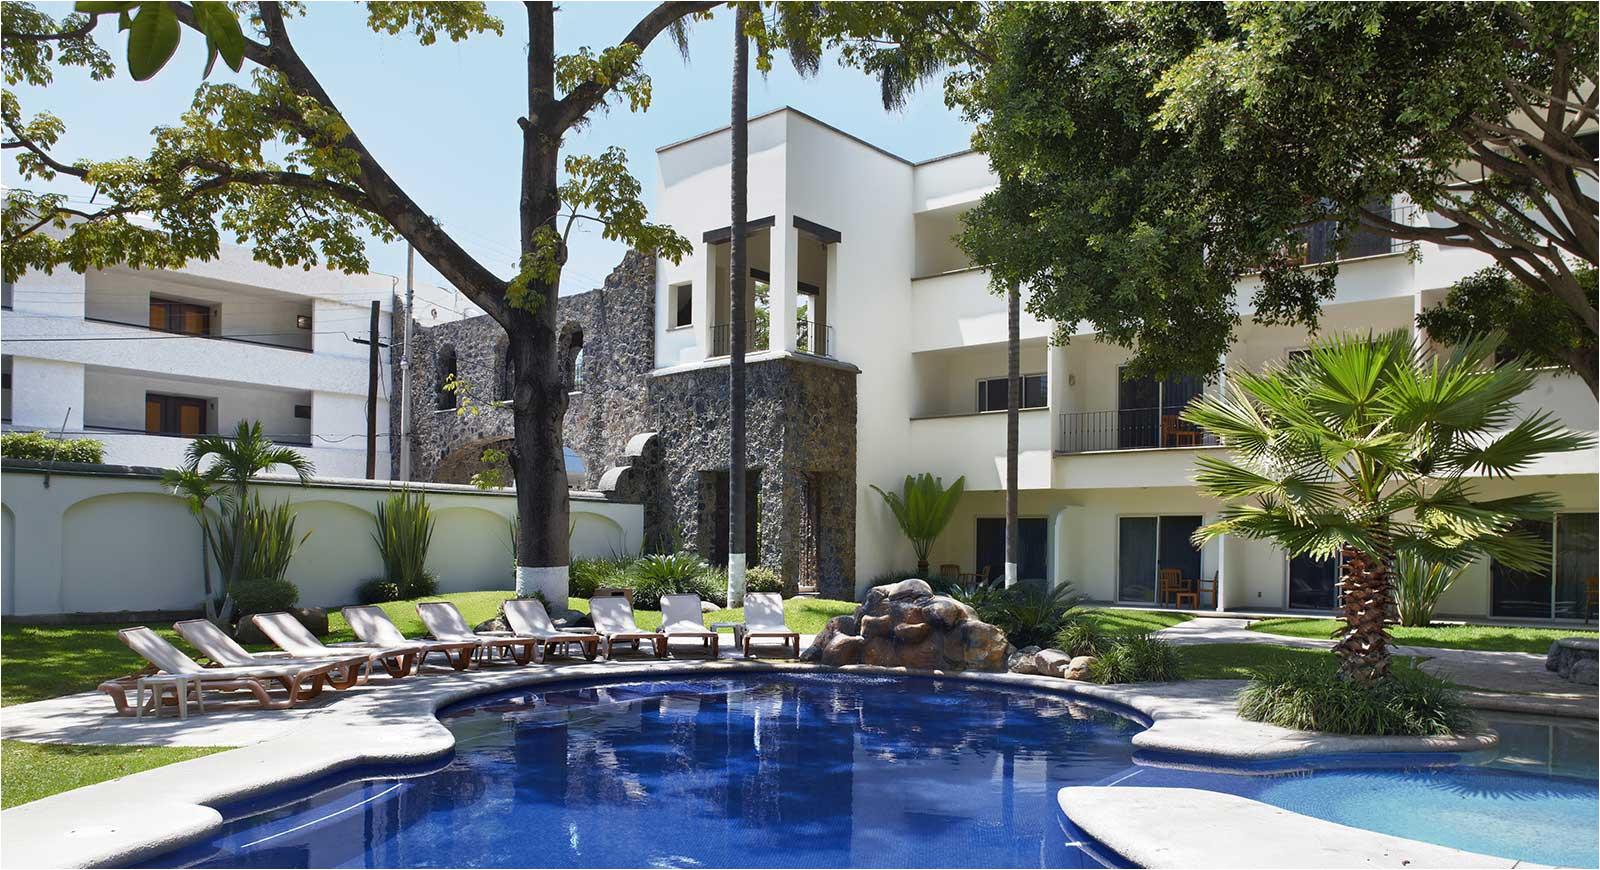 barcela mexico reforma exclusive hotel in the city centre barcelo com